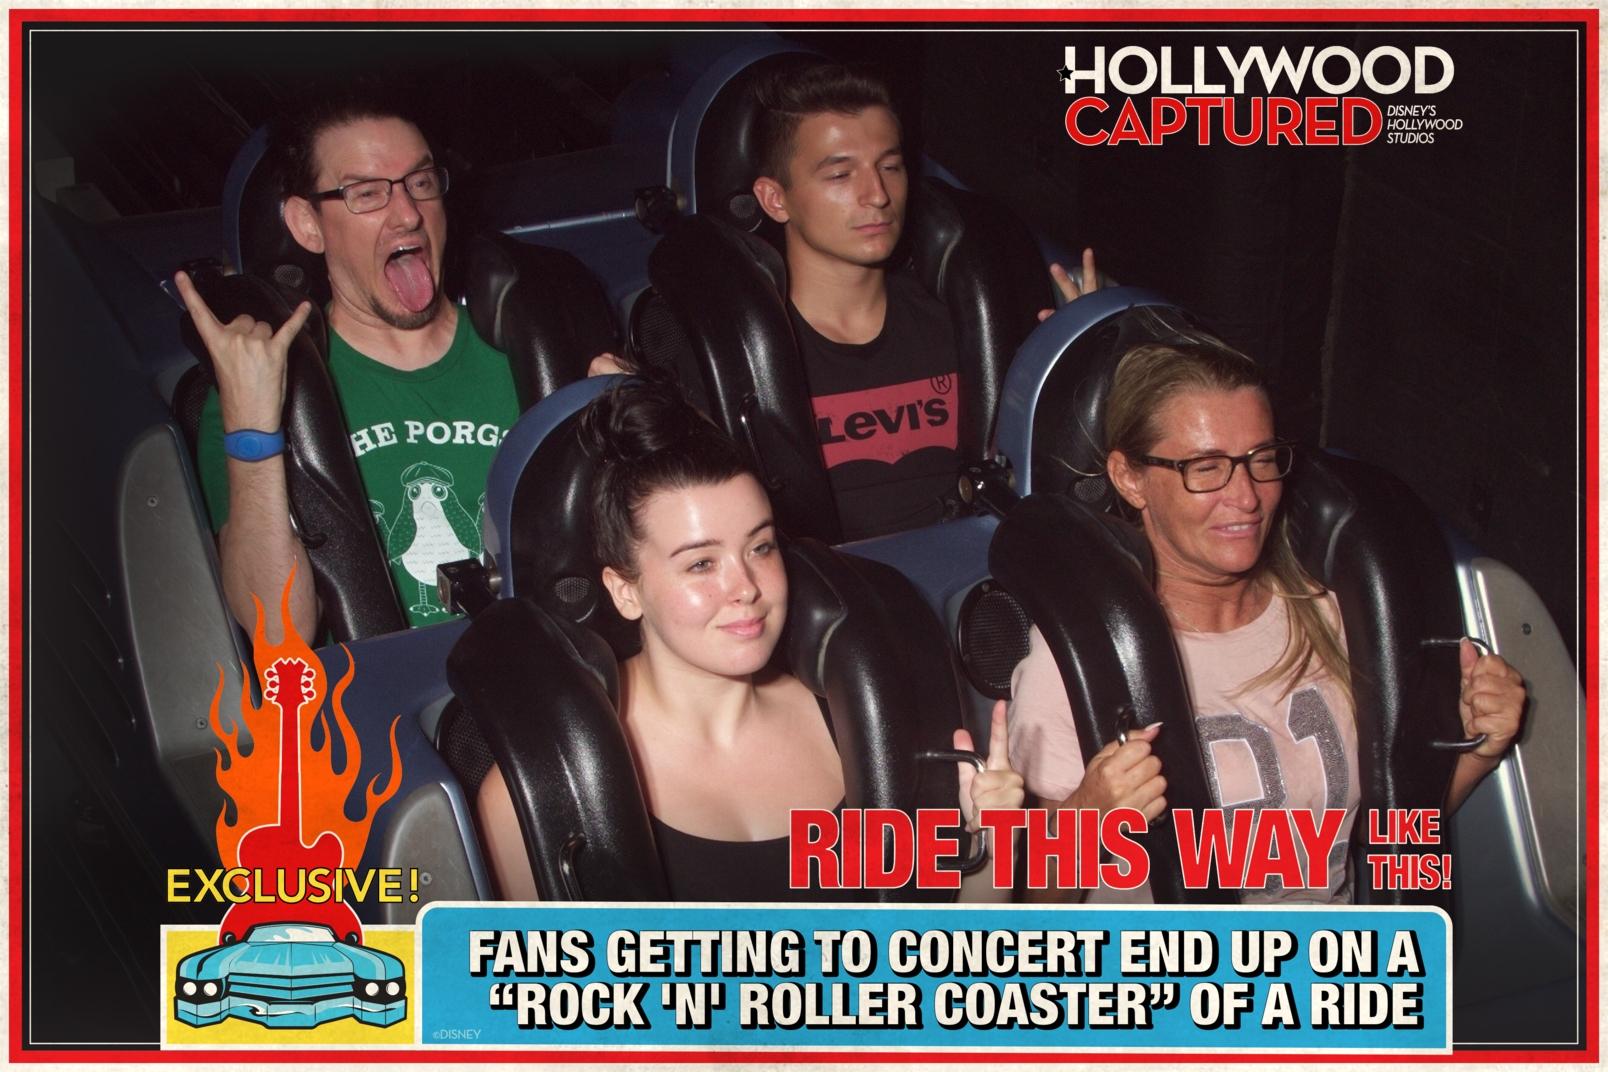 Walt Disney World Vacation: Day 3 (Disney's Hollywood Studios / Magic Kingdom) October 1st 2019 (2)